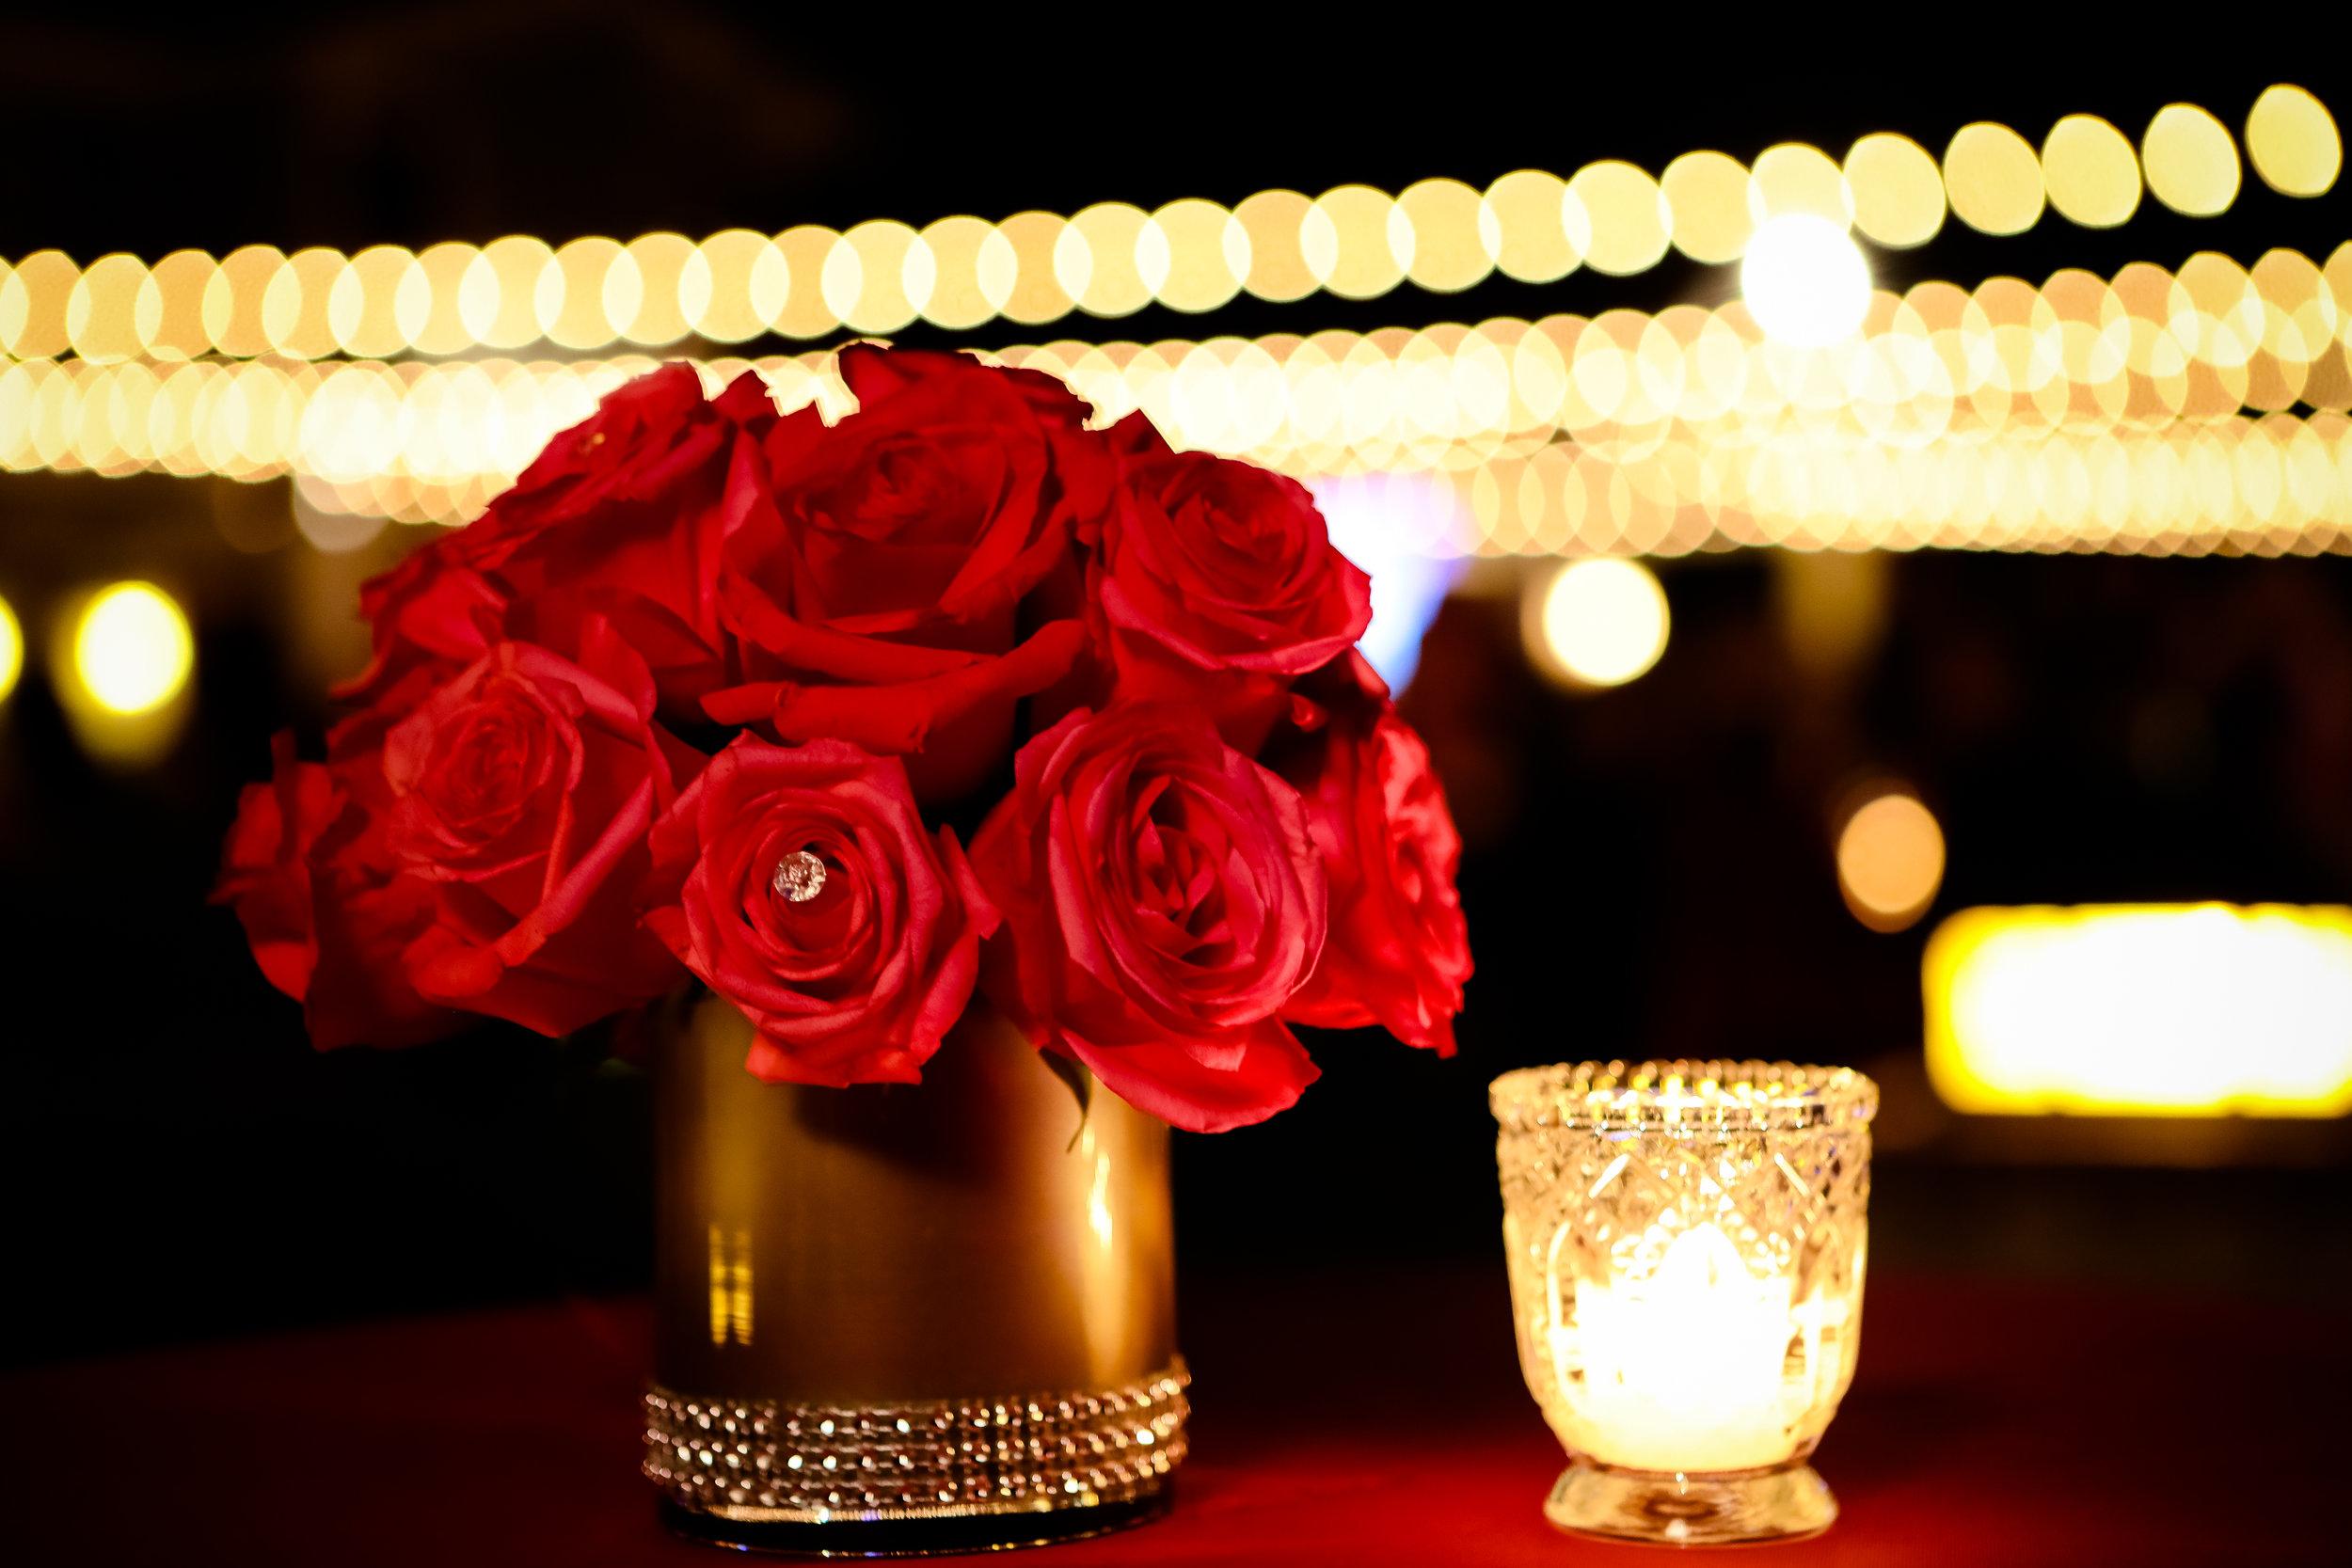 mkp 5A Diamonds & Roses-299.jpg